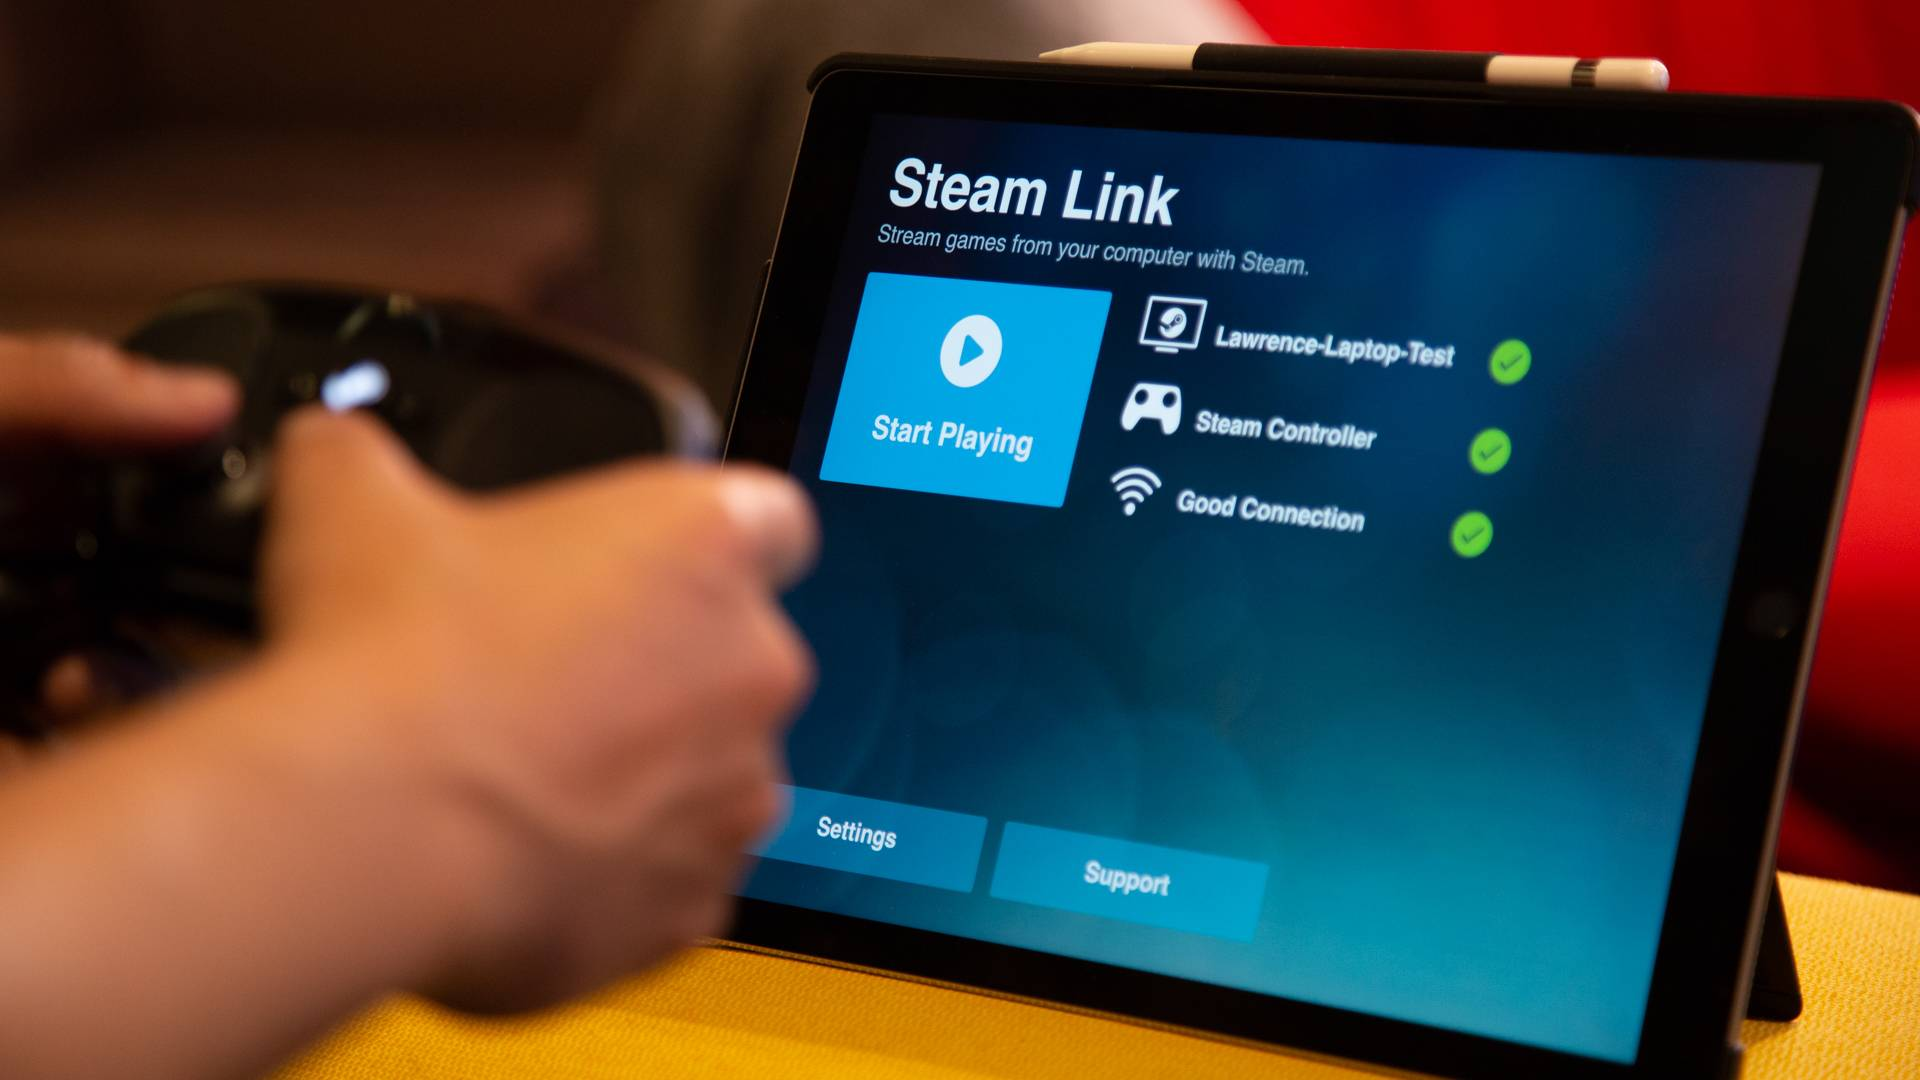 Steam 云游戏曝光,但你可能还玩不到